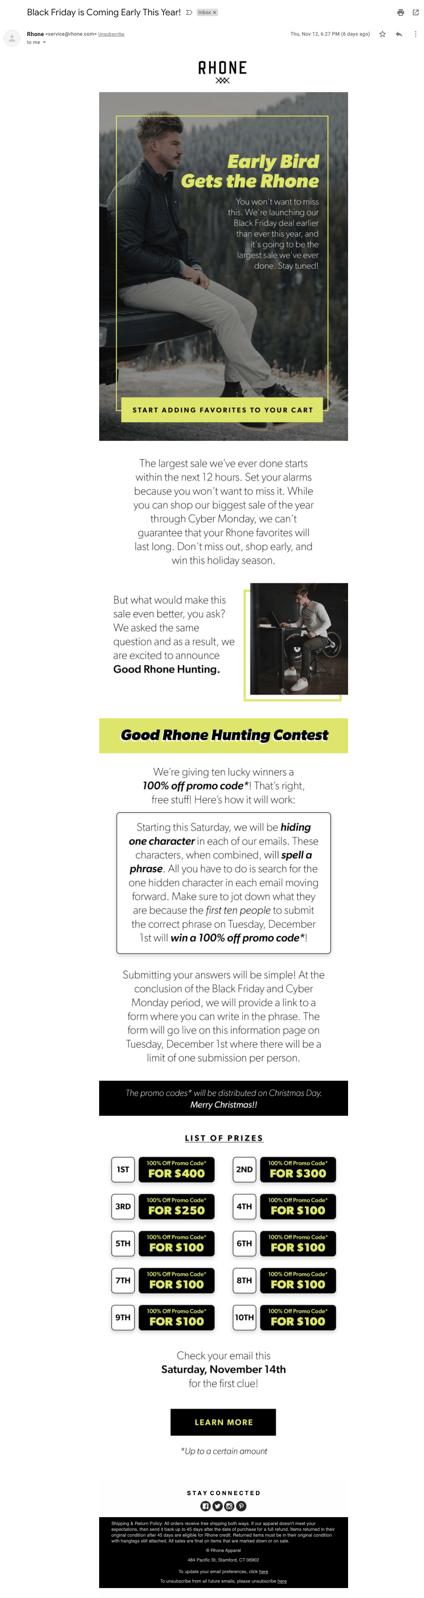 Rhone early BFCM announcement